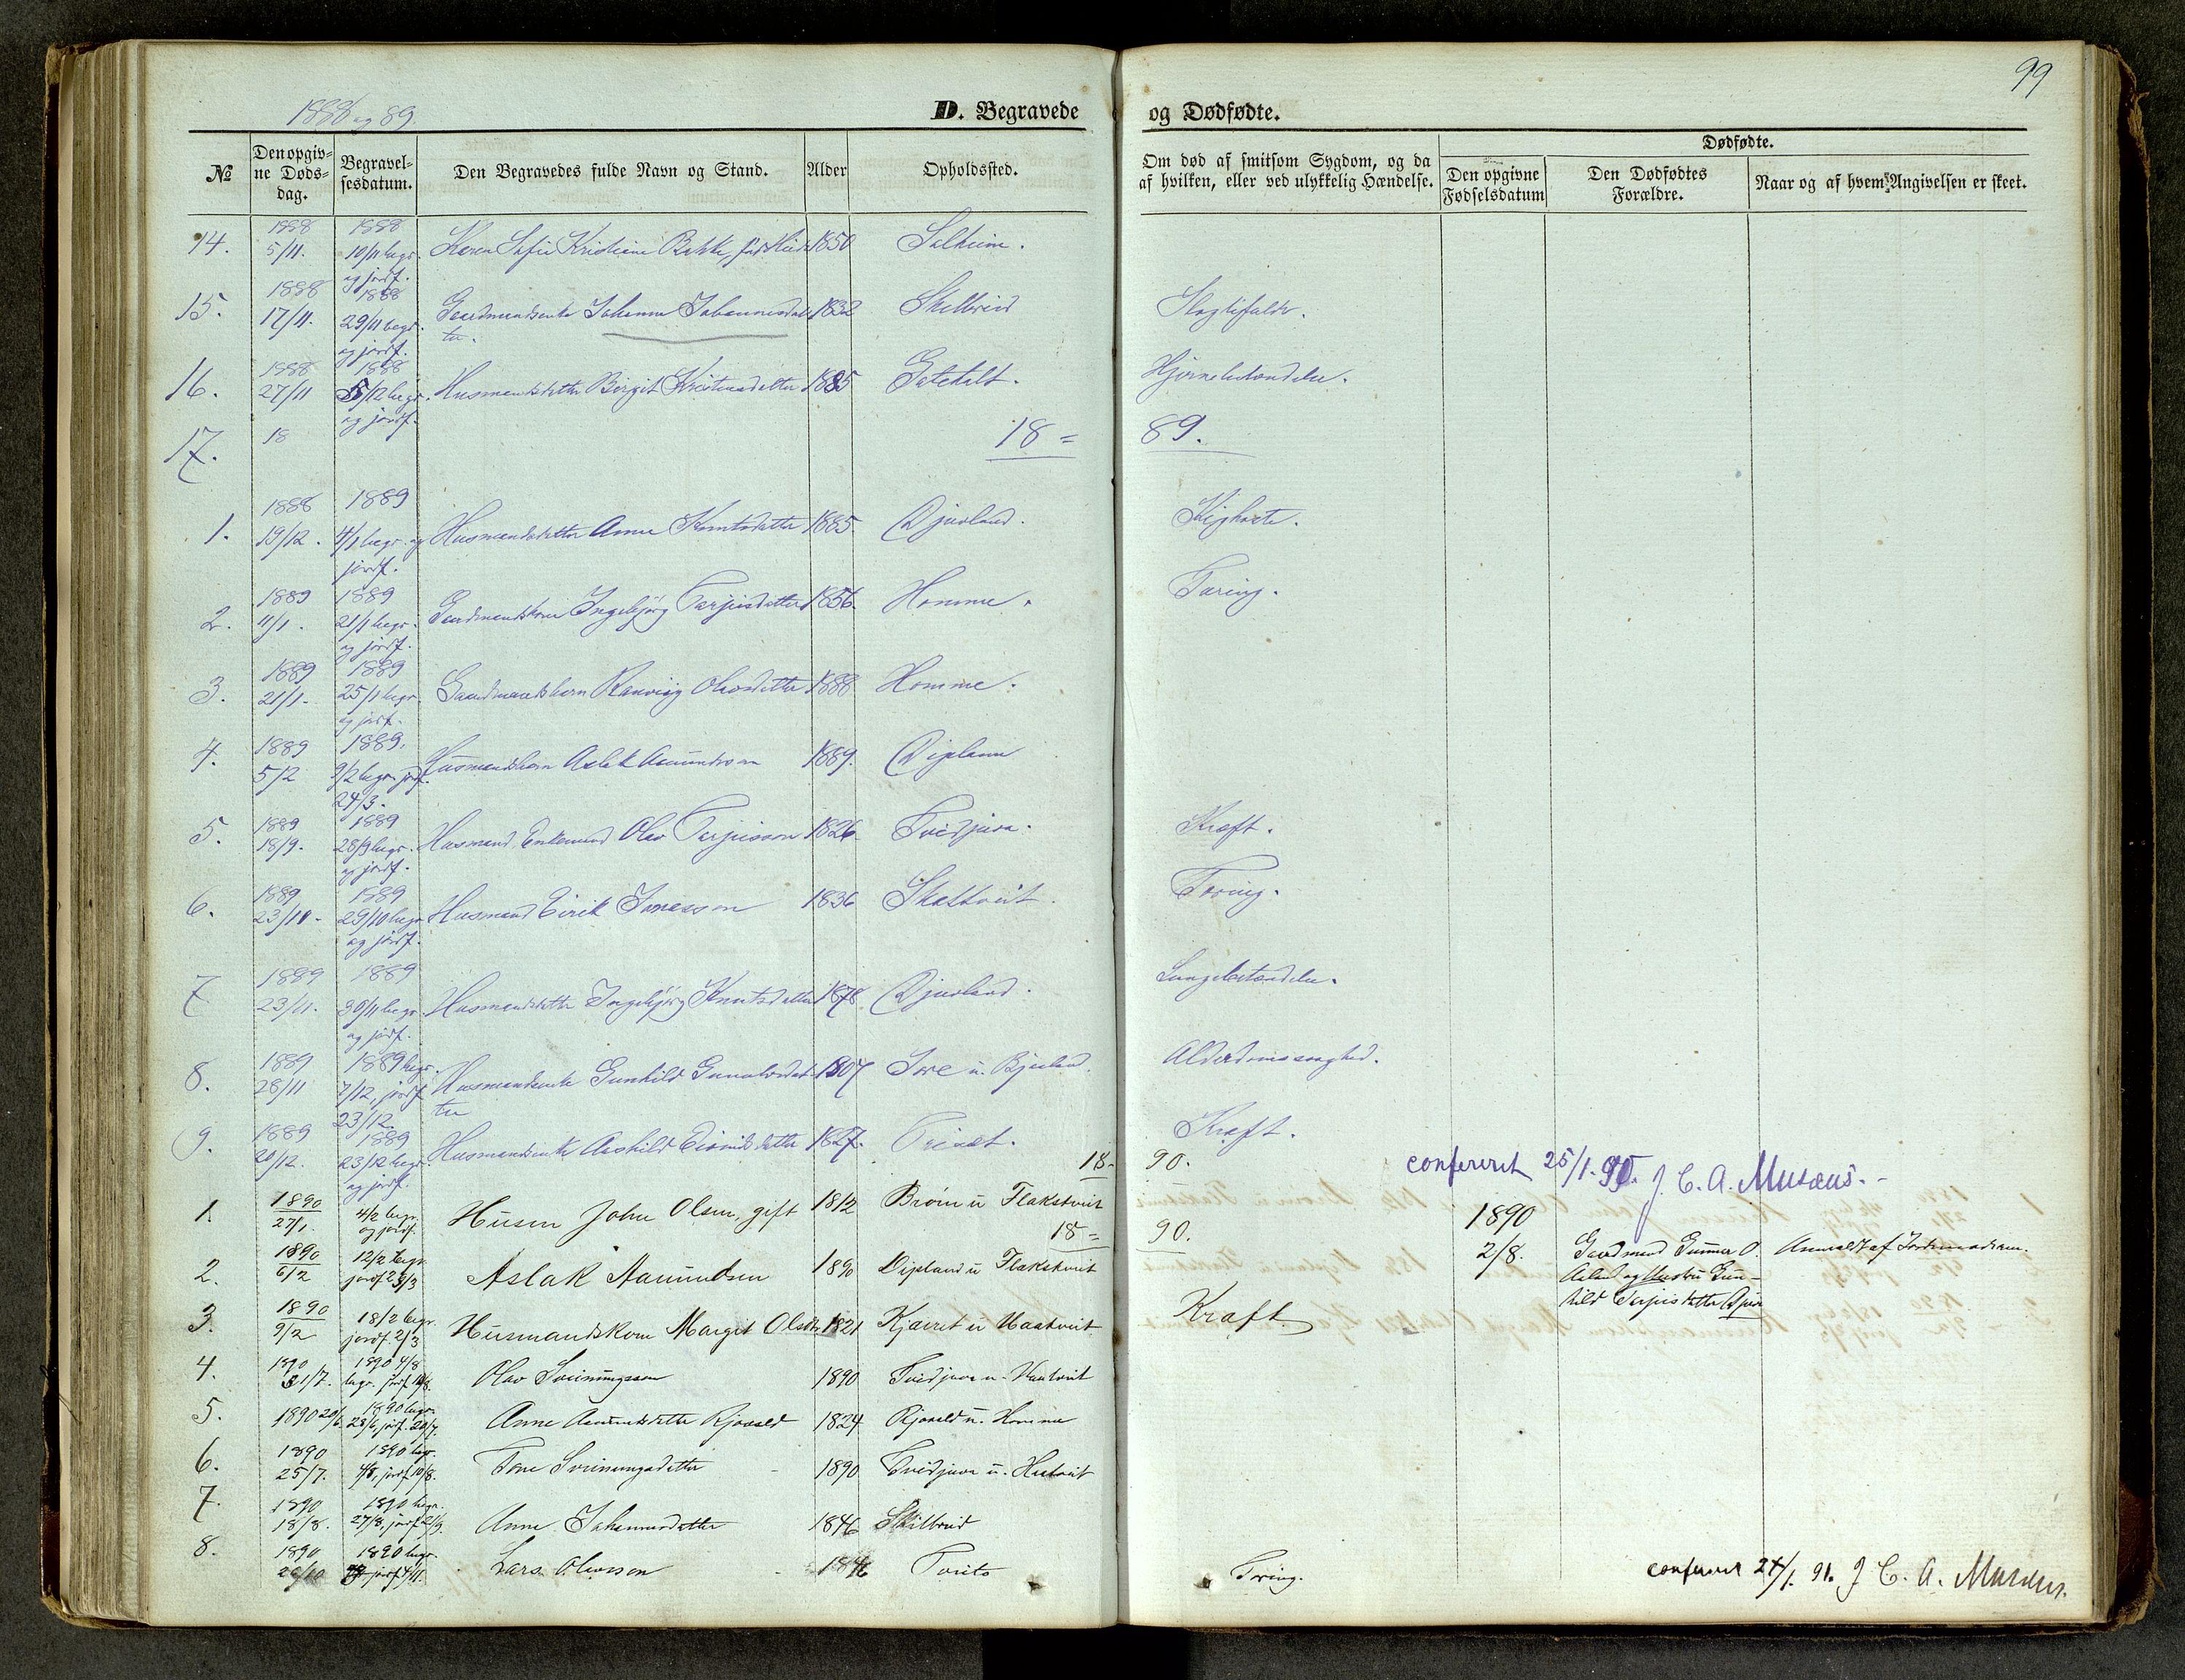 SAKO, Lårdal kirkebøker, G/Ga/L0002: Klokkerbok nr. I 2, 1861-1890, s. 99